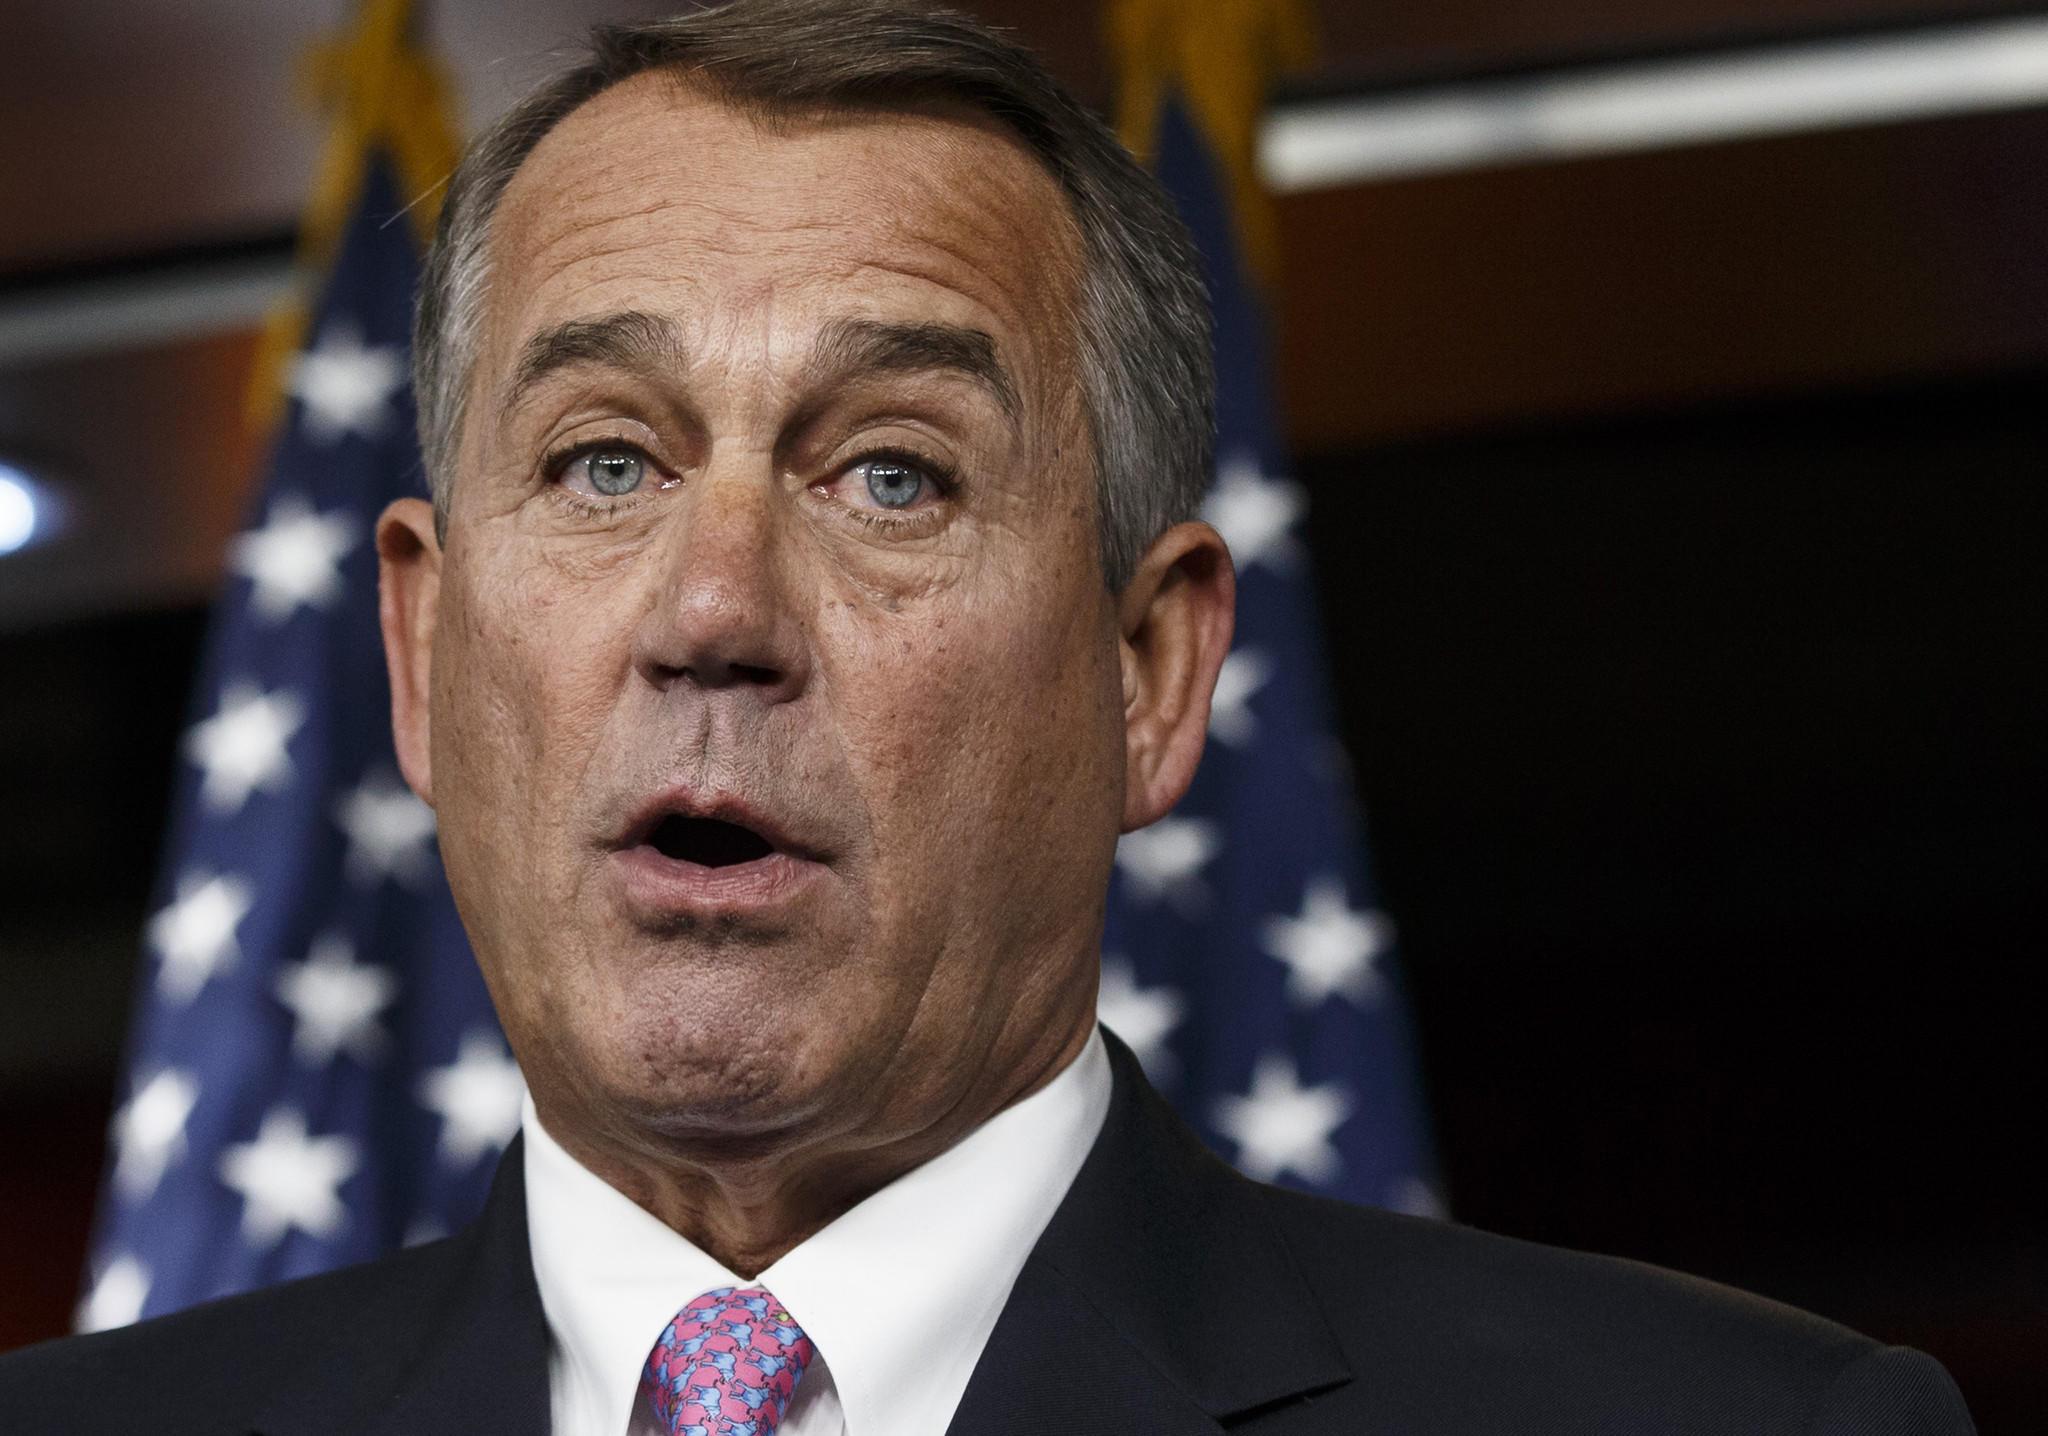 House Speaker John A. Boehner says the Senate bill to extend jobless benefits is unworkable.